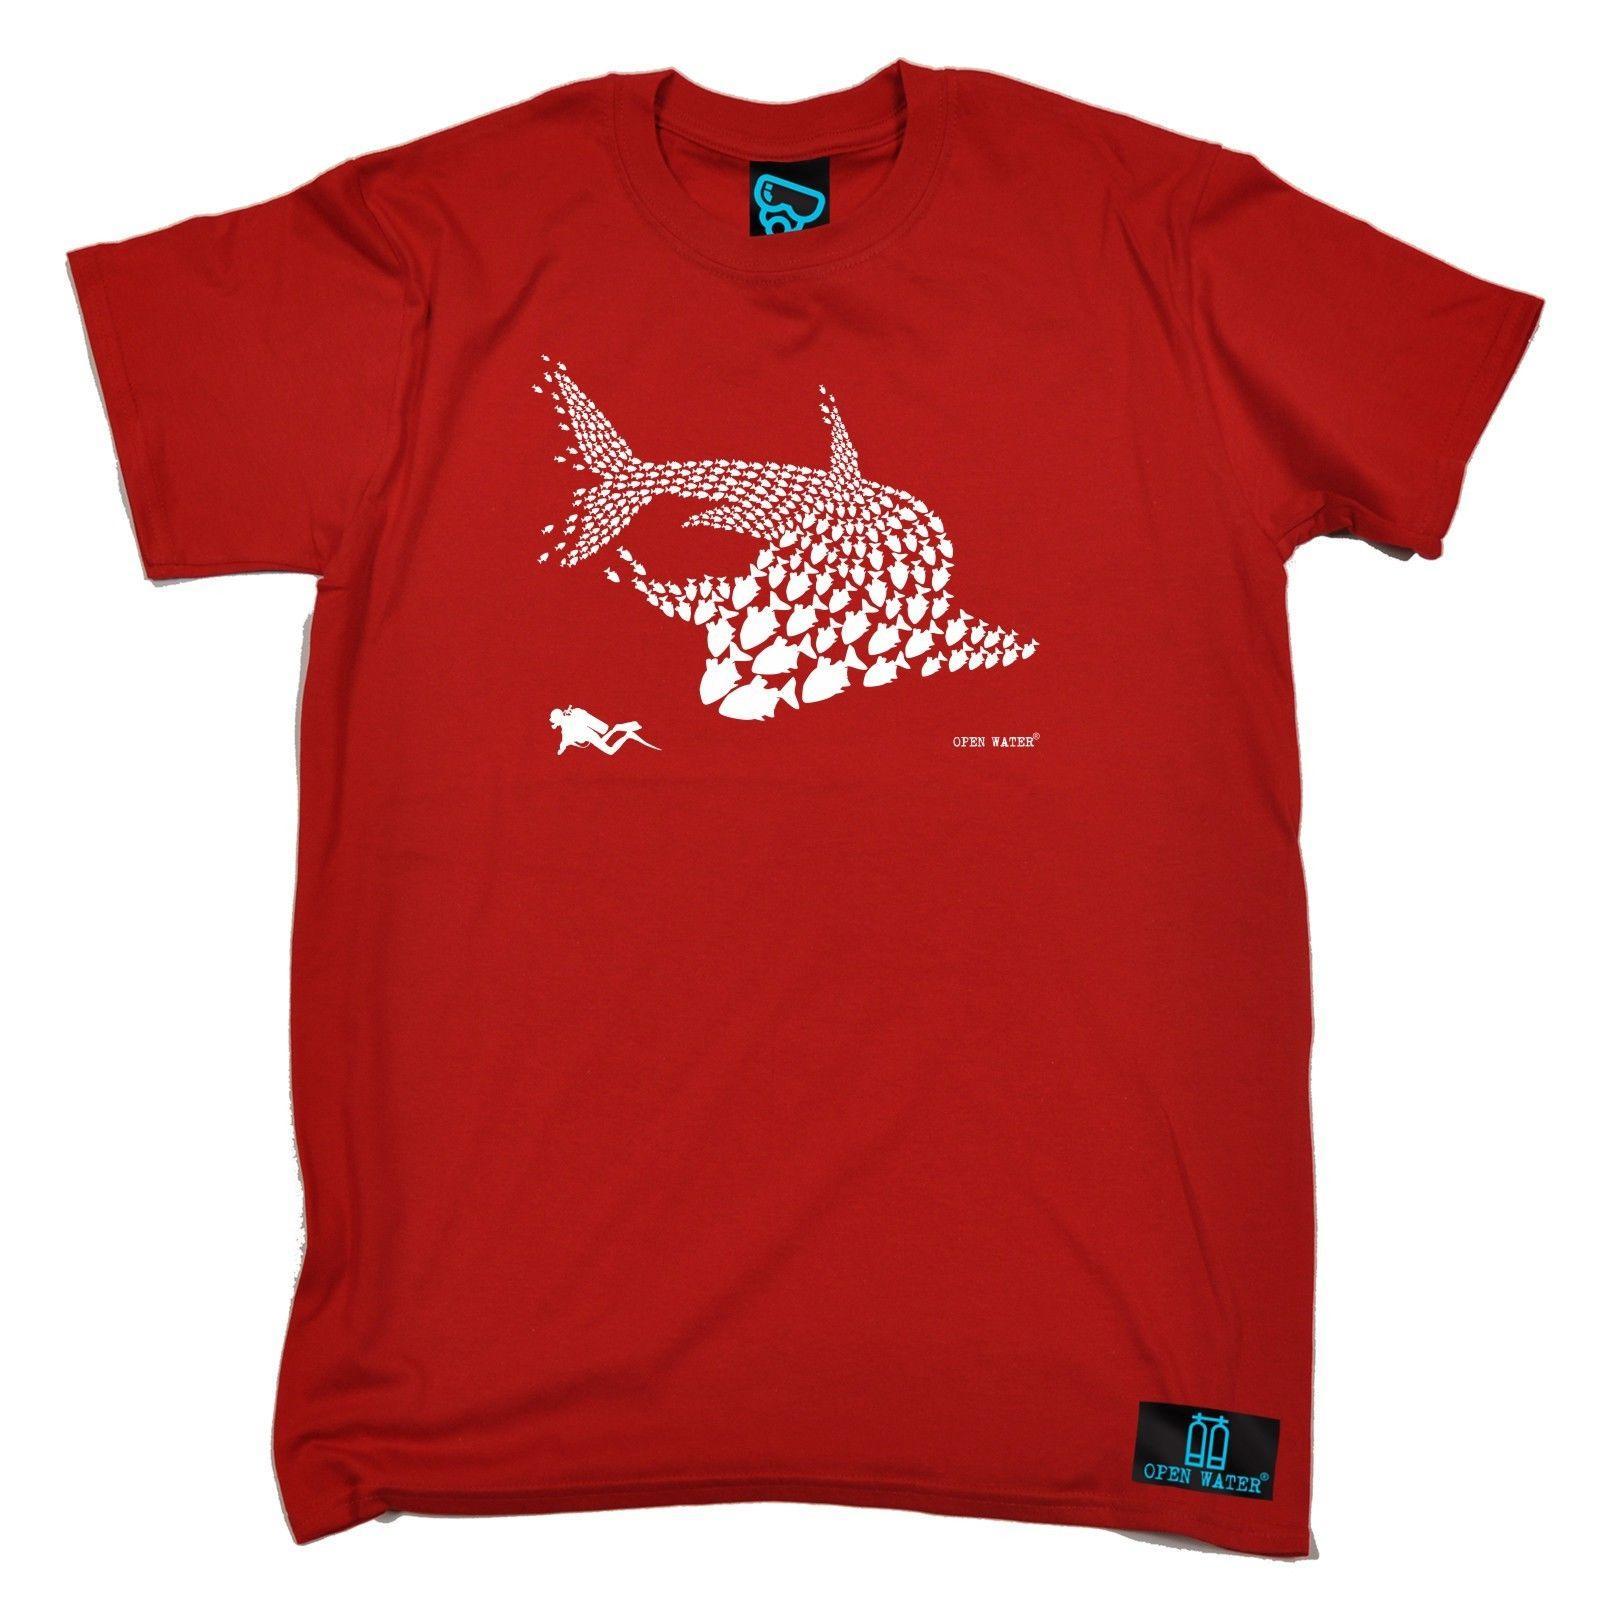 c933215b7f061 Diving Fish Shark Diver Diver Tank Mask Funny Birthday Gift Tshirt T SHIRT  Cool Casual Pride T Shirt Men Tee Shirt Of The Day Link Shirts From  Designtshirts ...